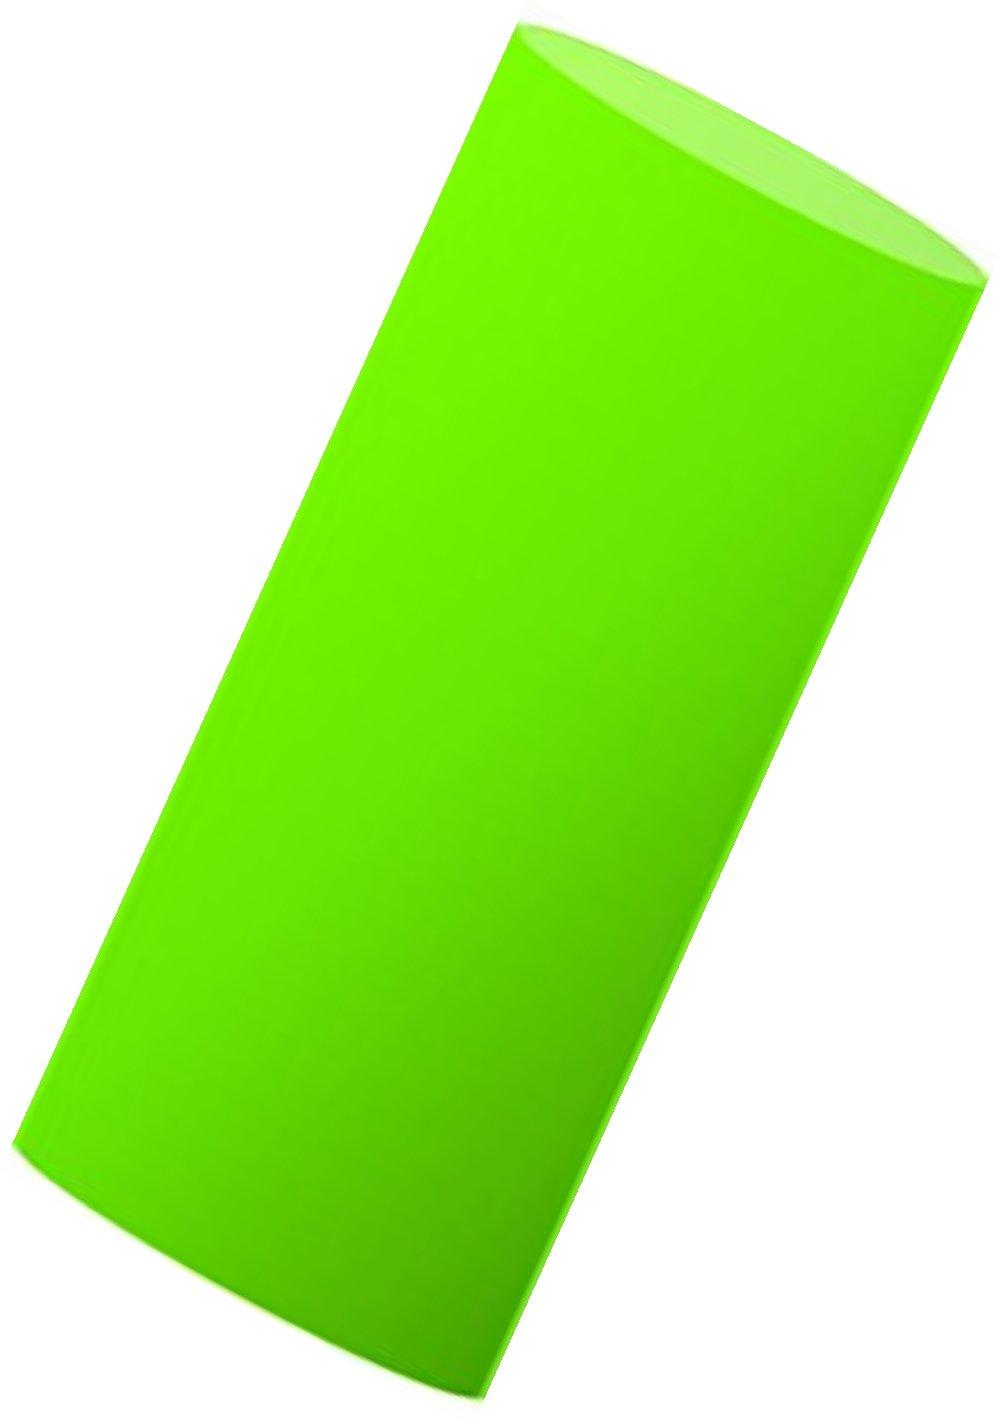 Siser EasyWeed Tシャツ用熱転写ビニール(HTV) 大幅コスト削減 12インチ(実寸法:11.8インチ)x10フィートロール DSI-1210F-F-Green B075M3KSM2 蛍光緑 蛍光緑